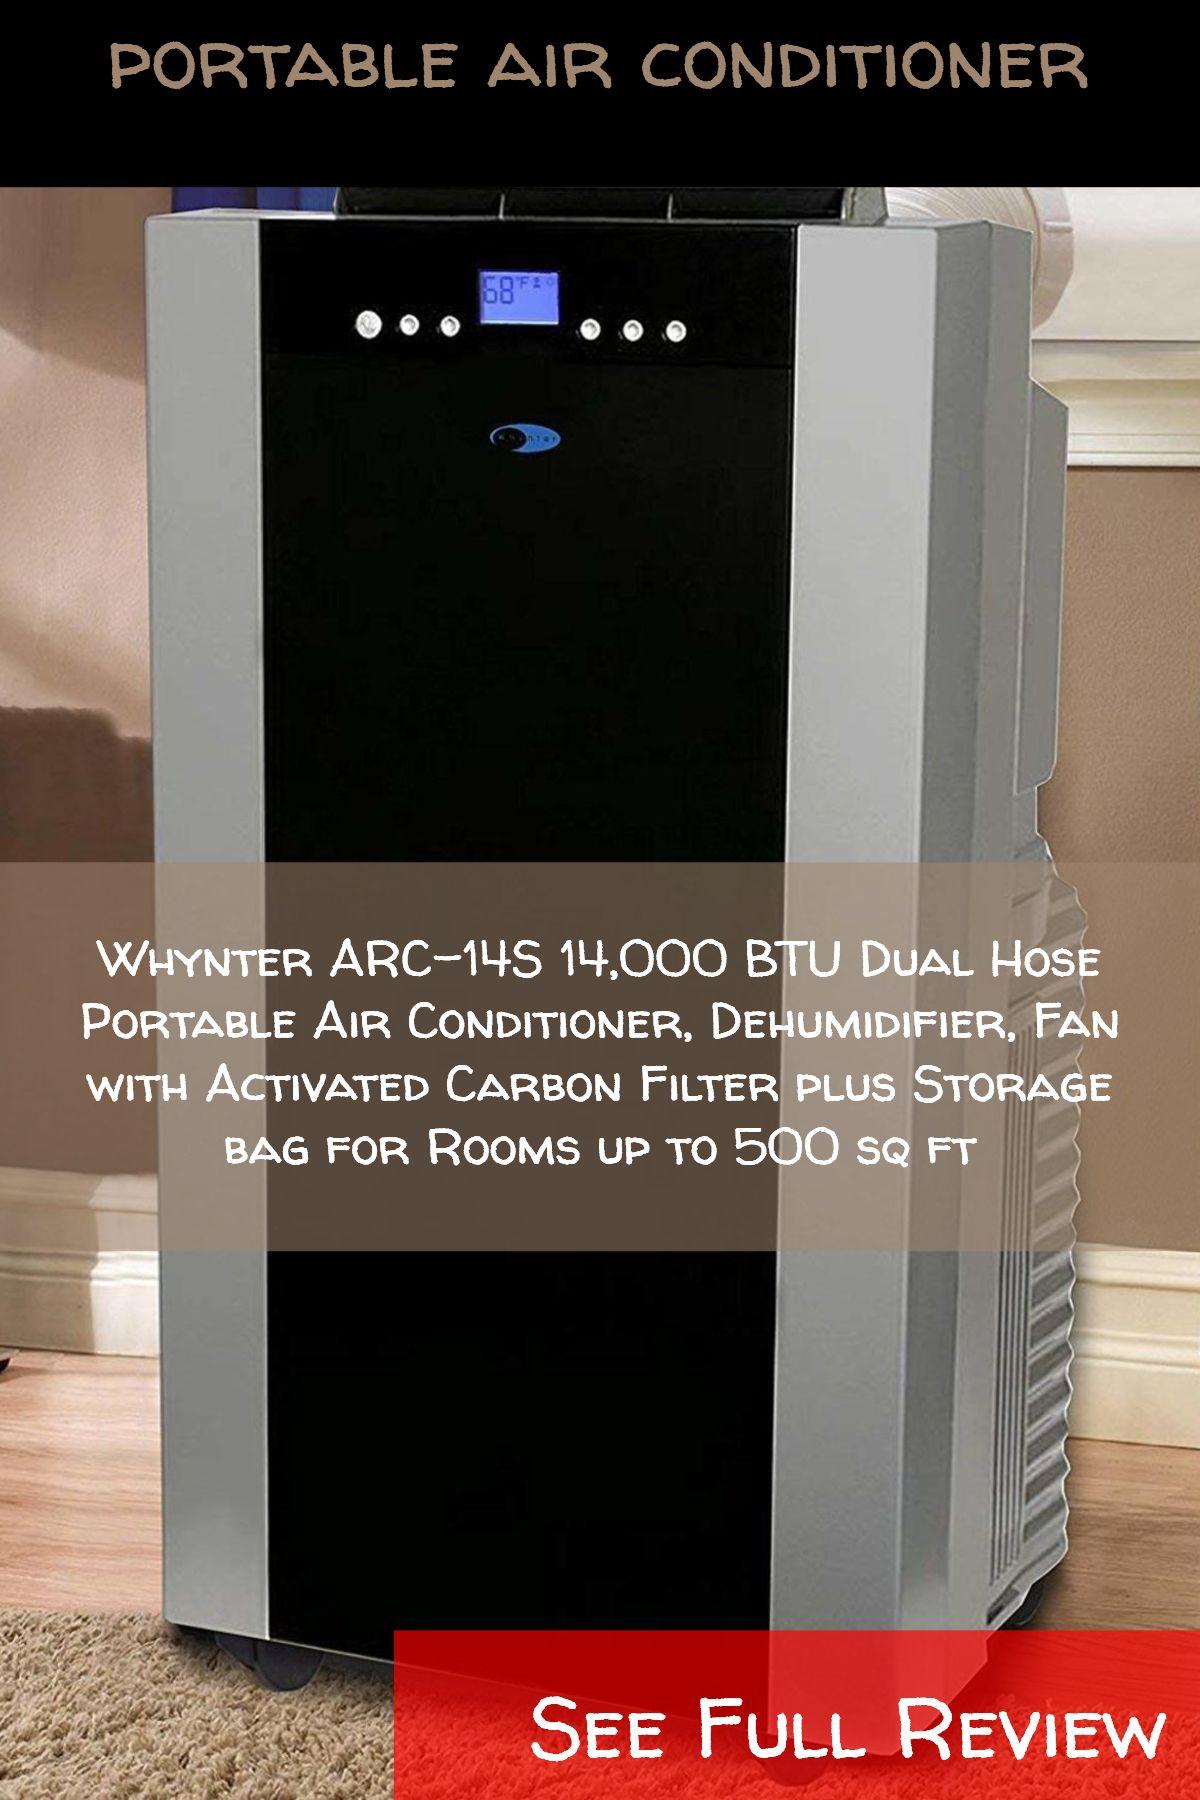 Whynter 14000 Btu Portable Air Conditioner